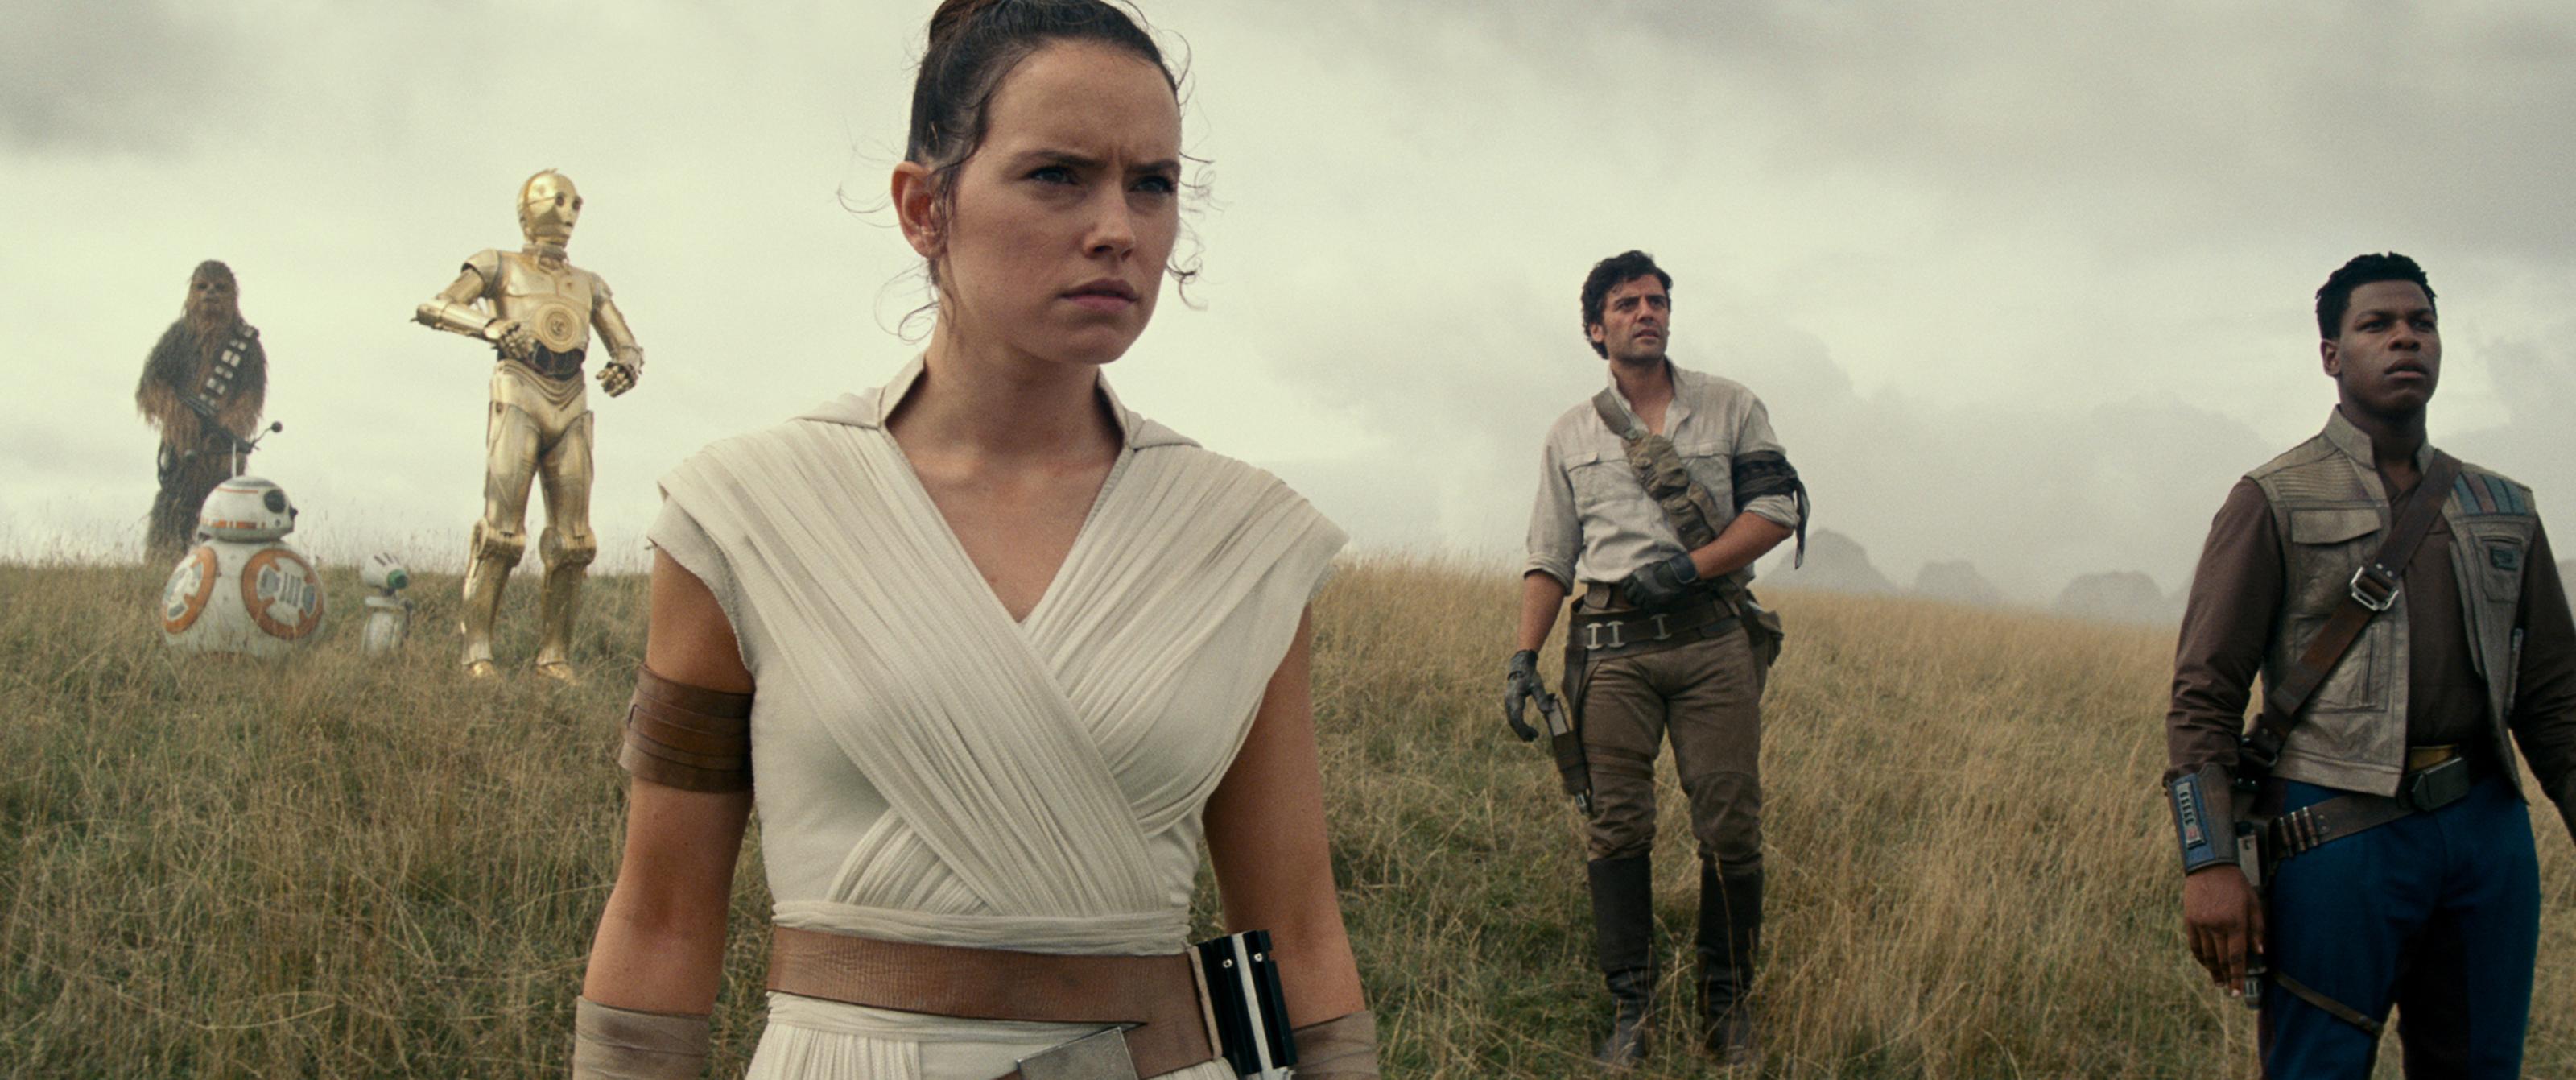 Disney+ shares definitive Star Wars timeline just in time for Clone Wars finale